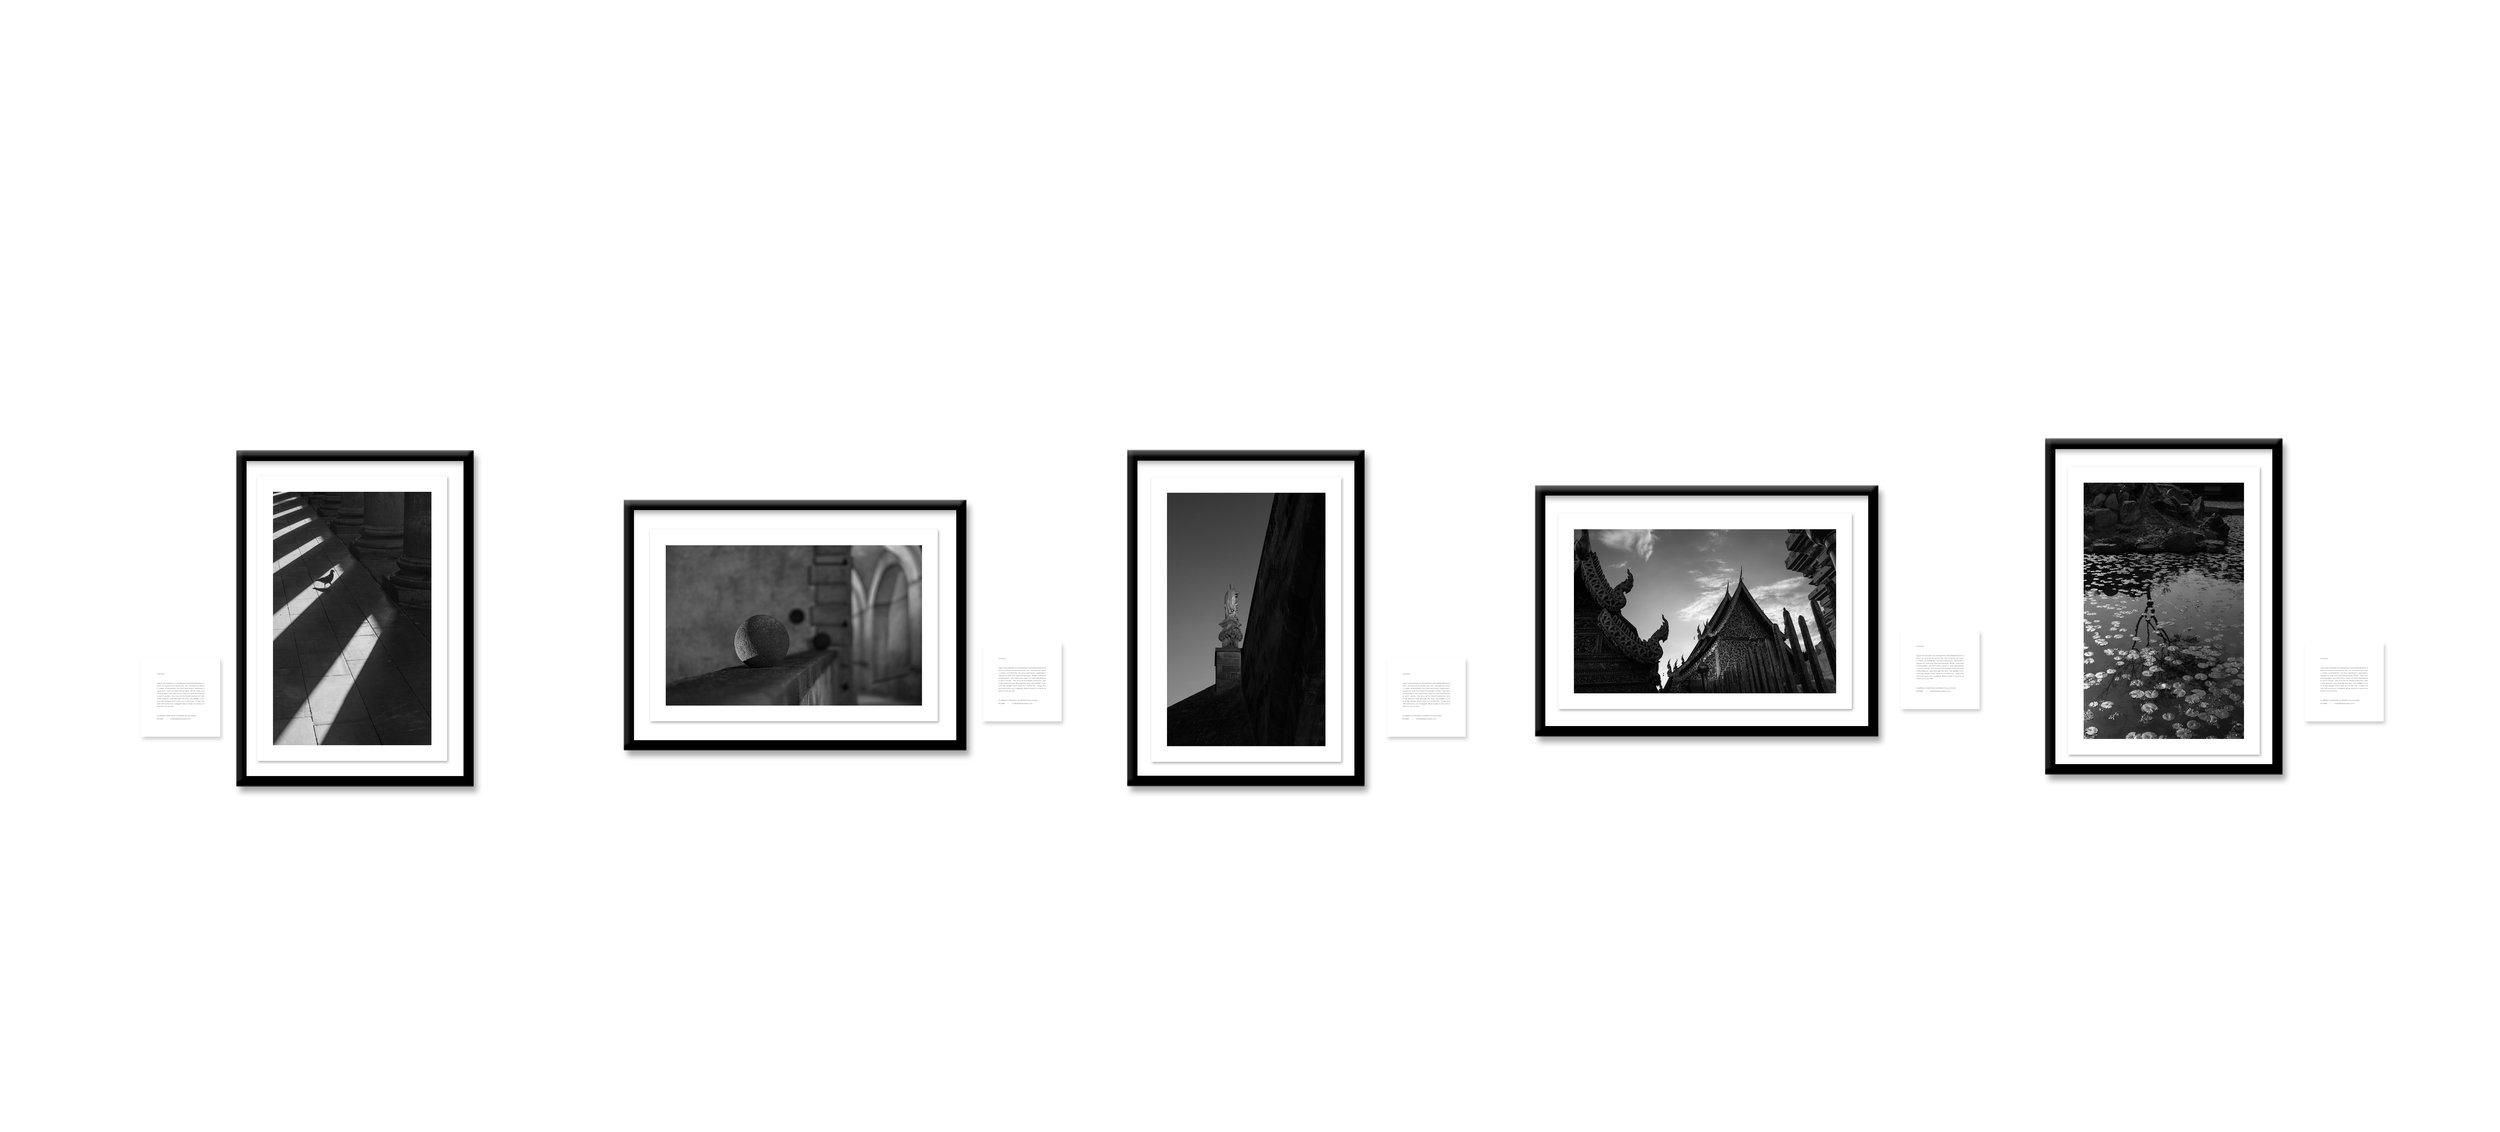 02_Large Wall.jpg